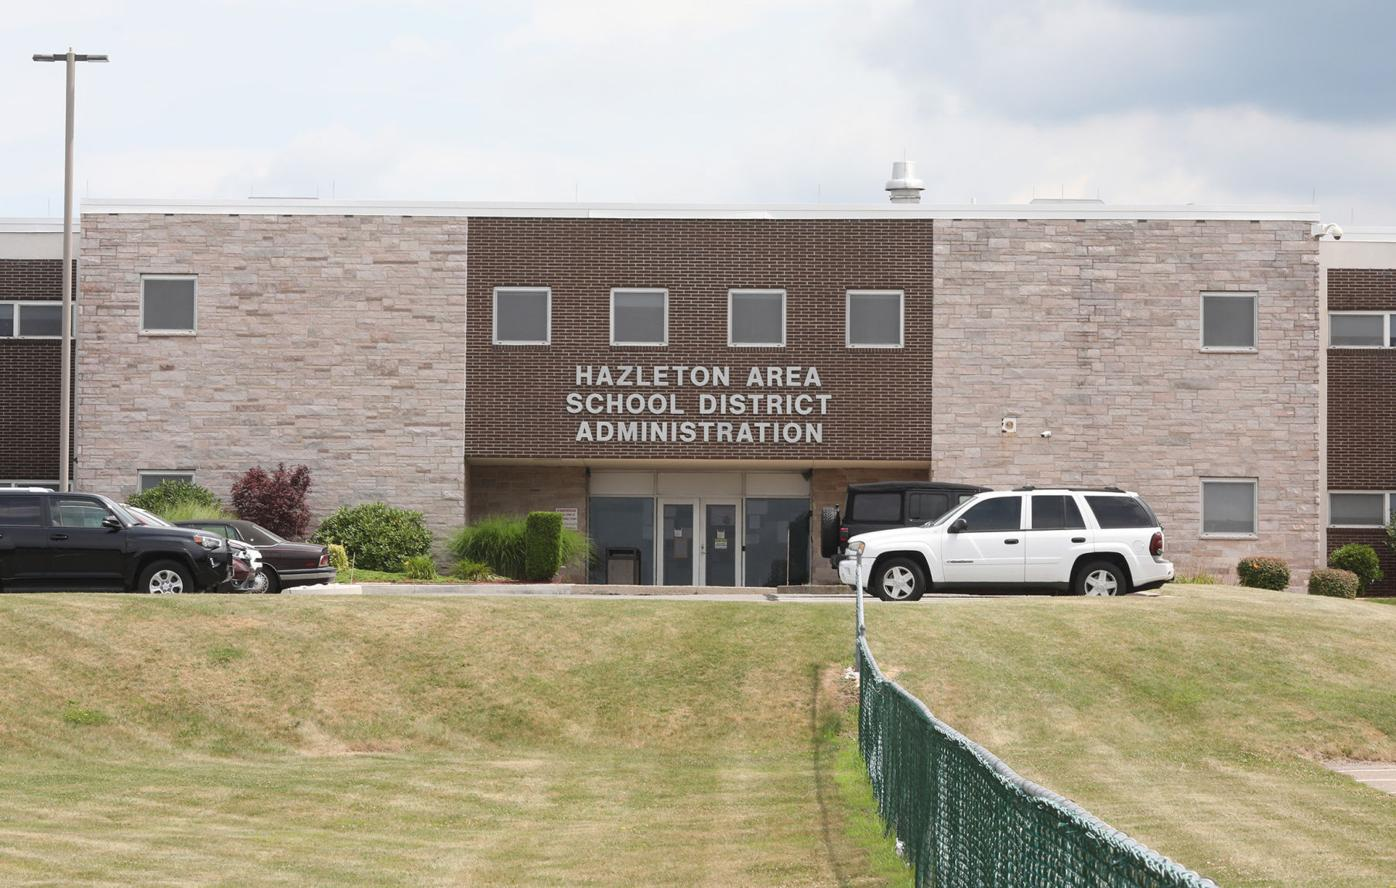 Hazleton Area School District